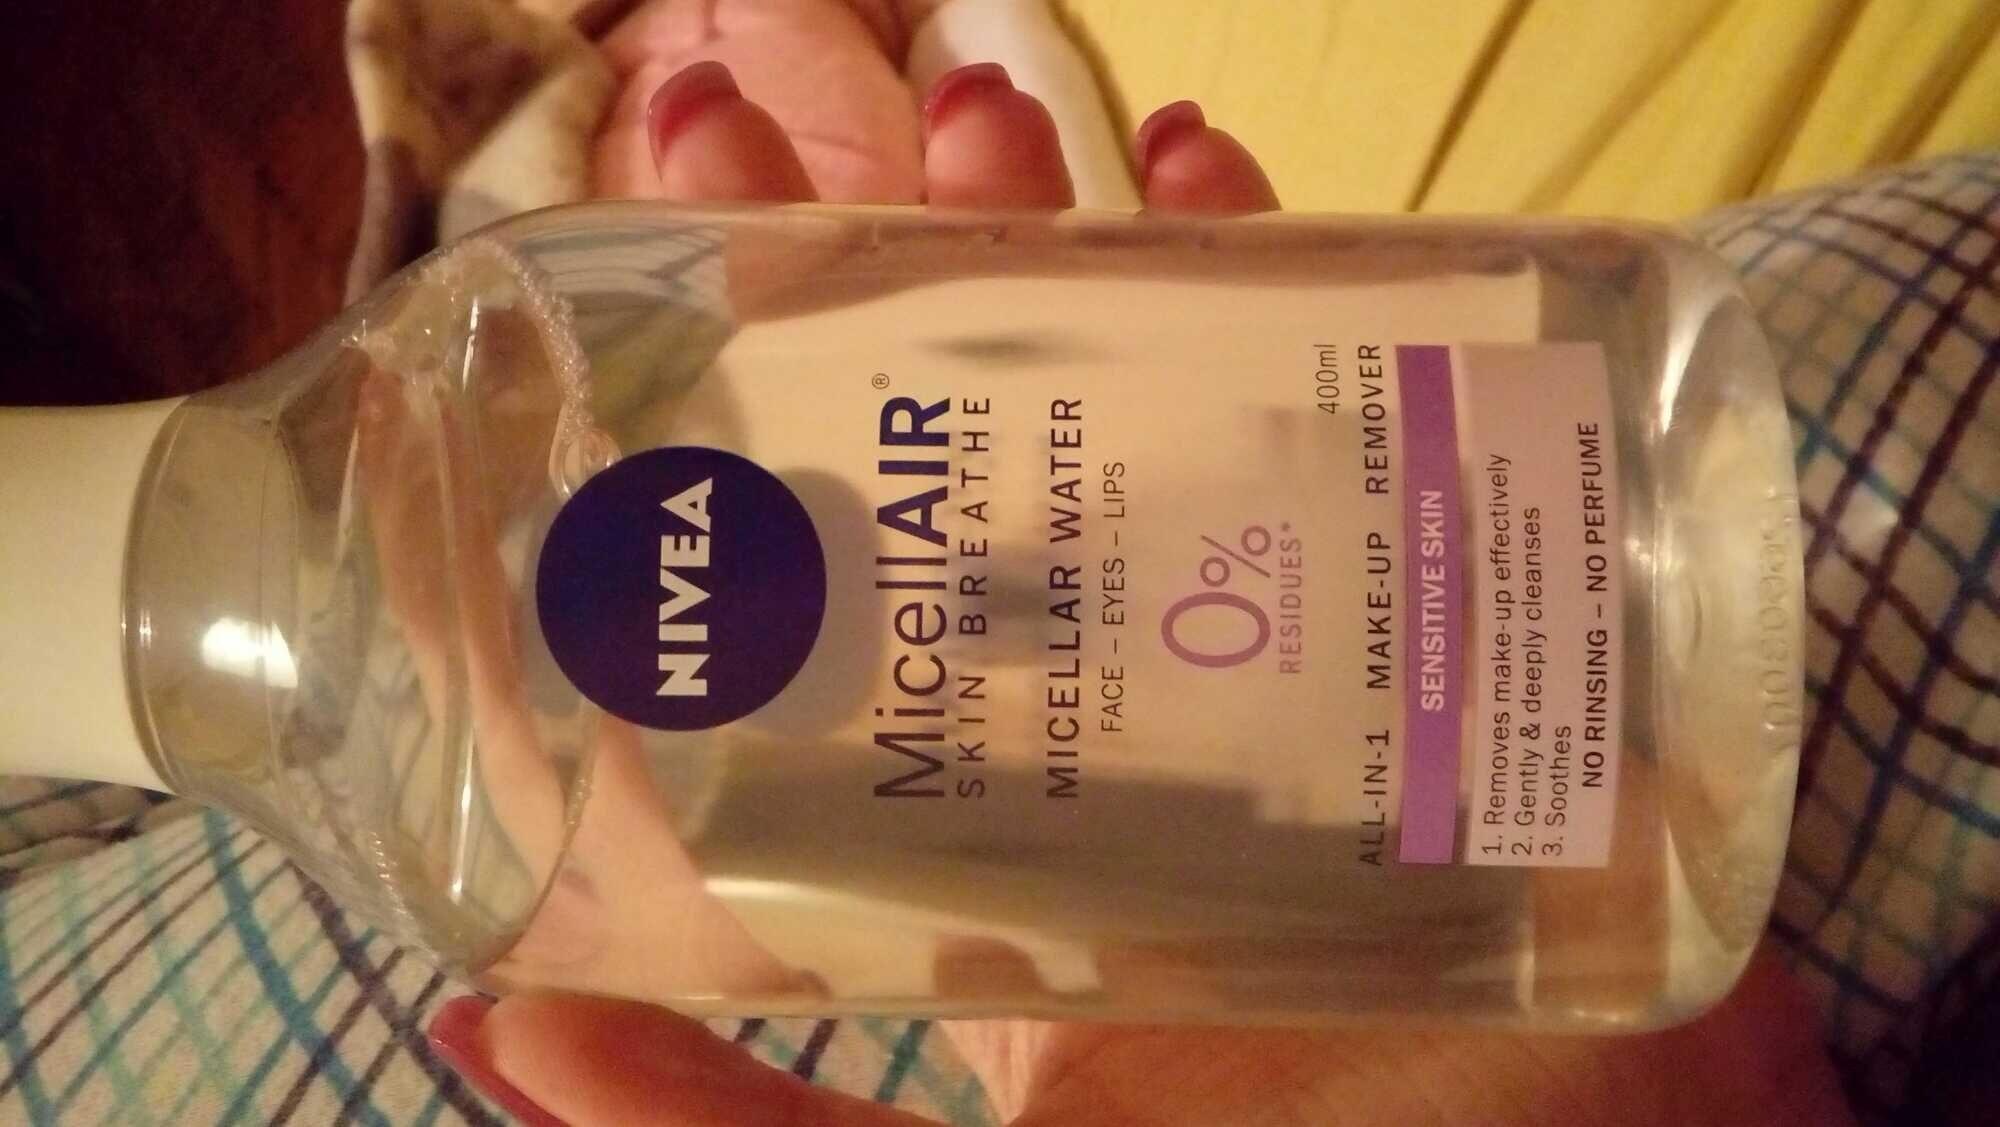 MicellAIR skin breathe micellar water - Product - en